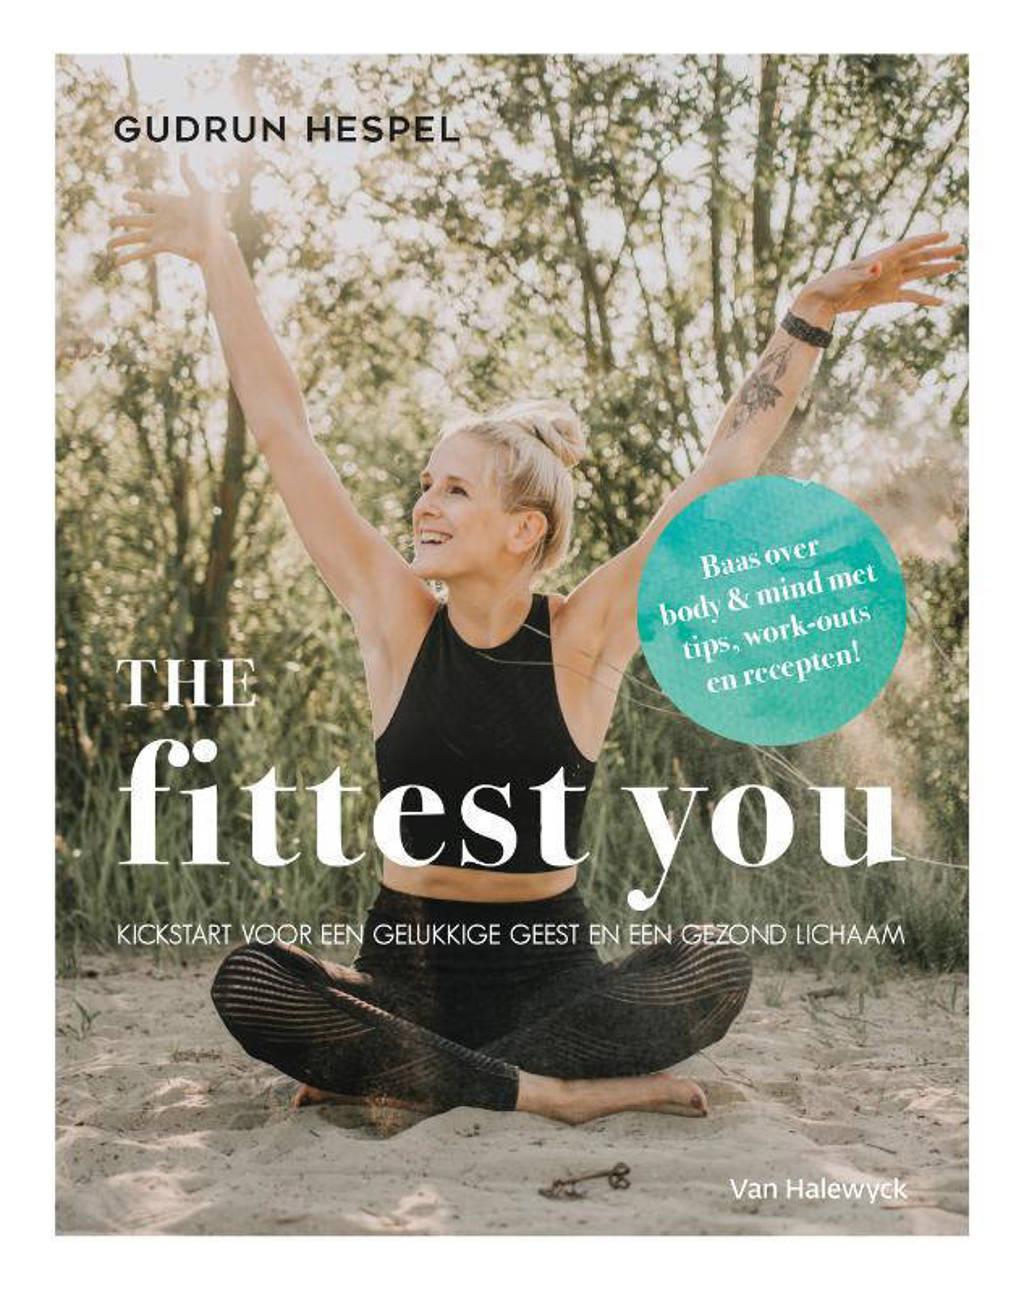 The fittest you - Gudrun Hespel